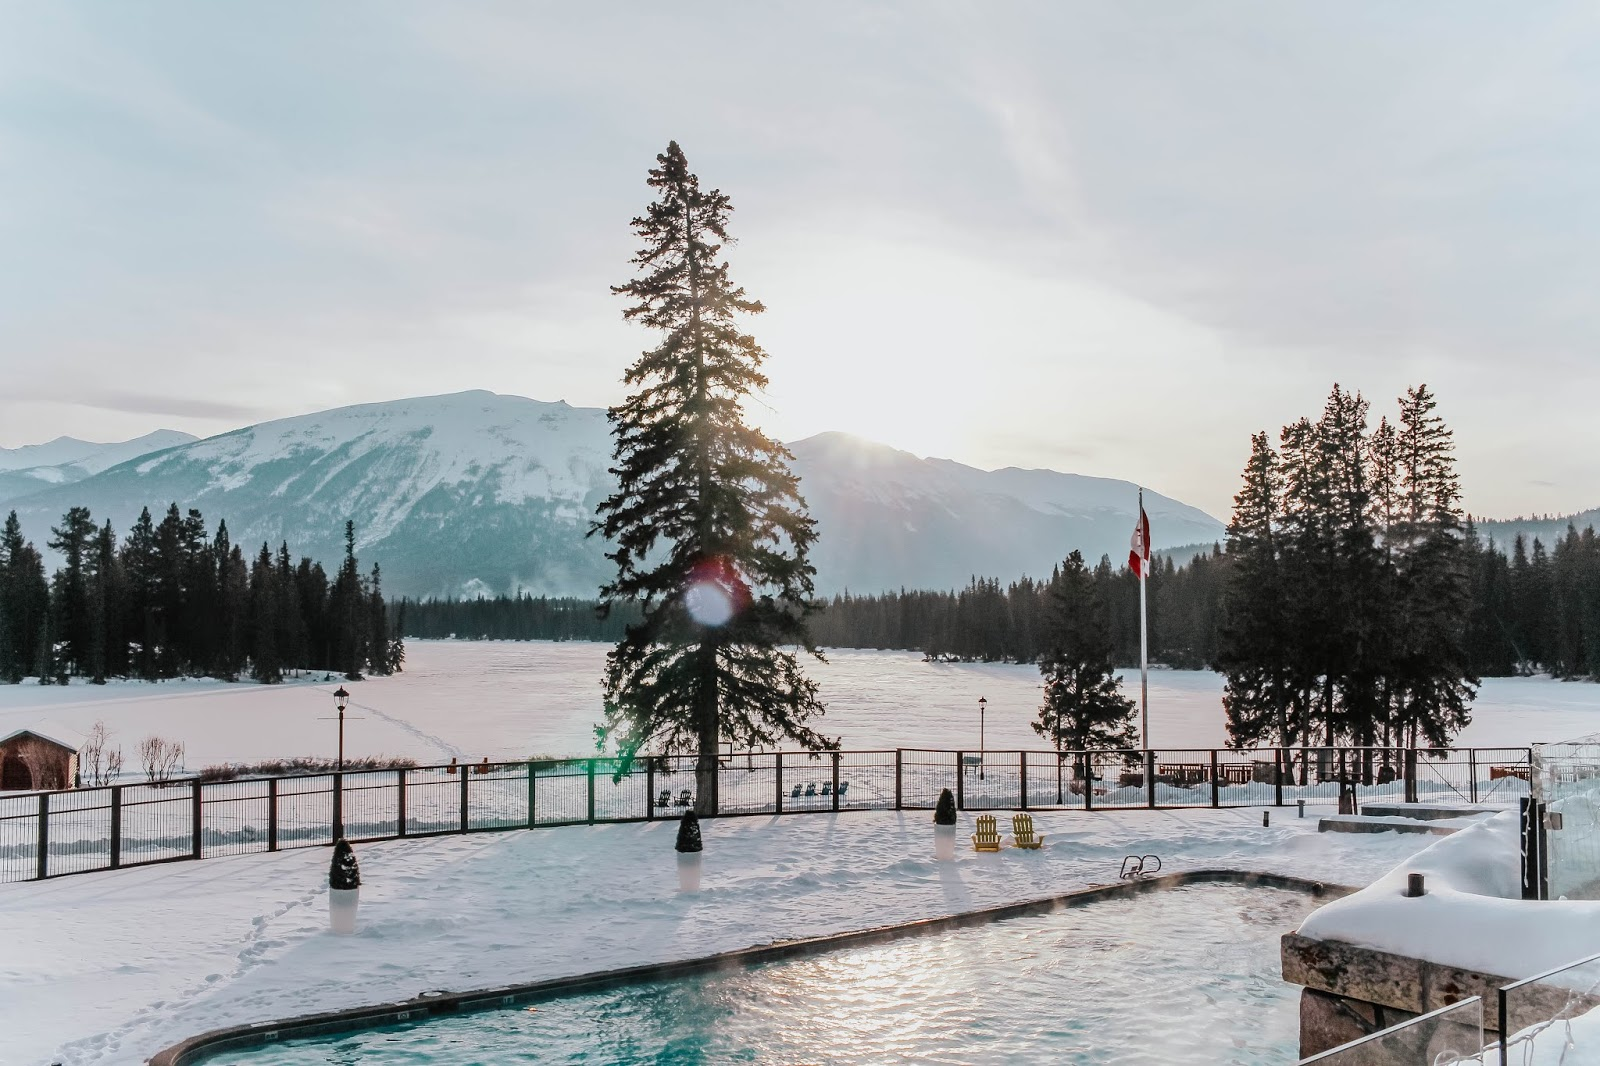 fairmont jasper park lodge, alberta, canada